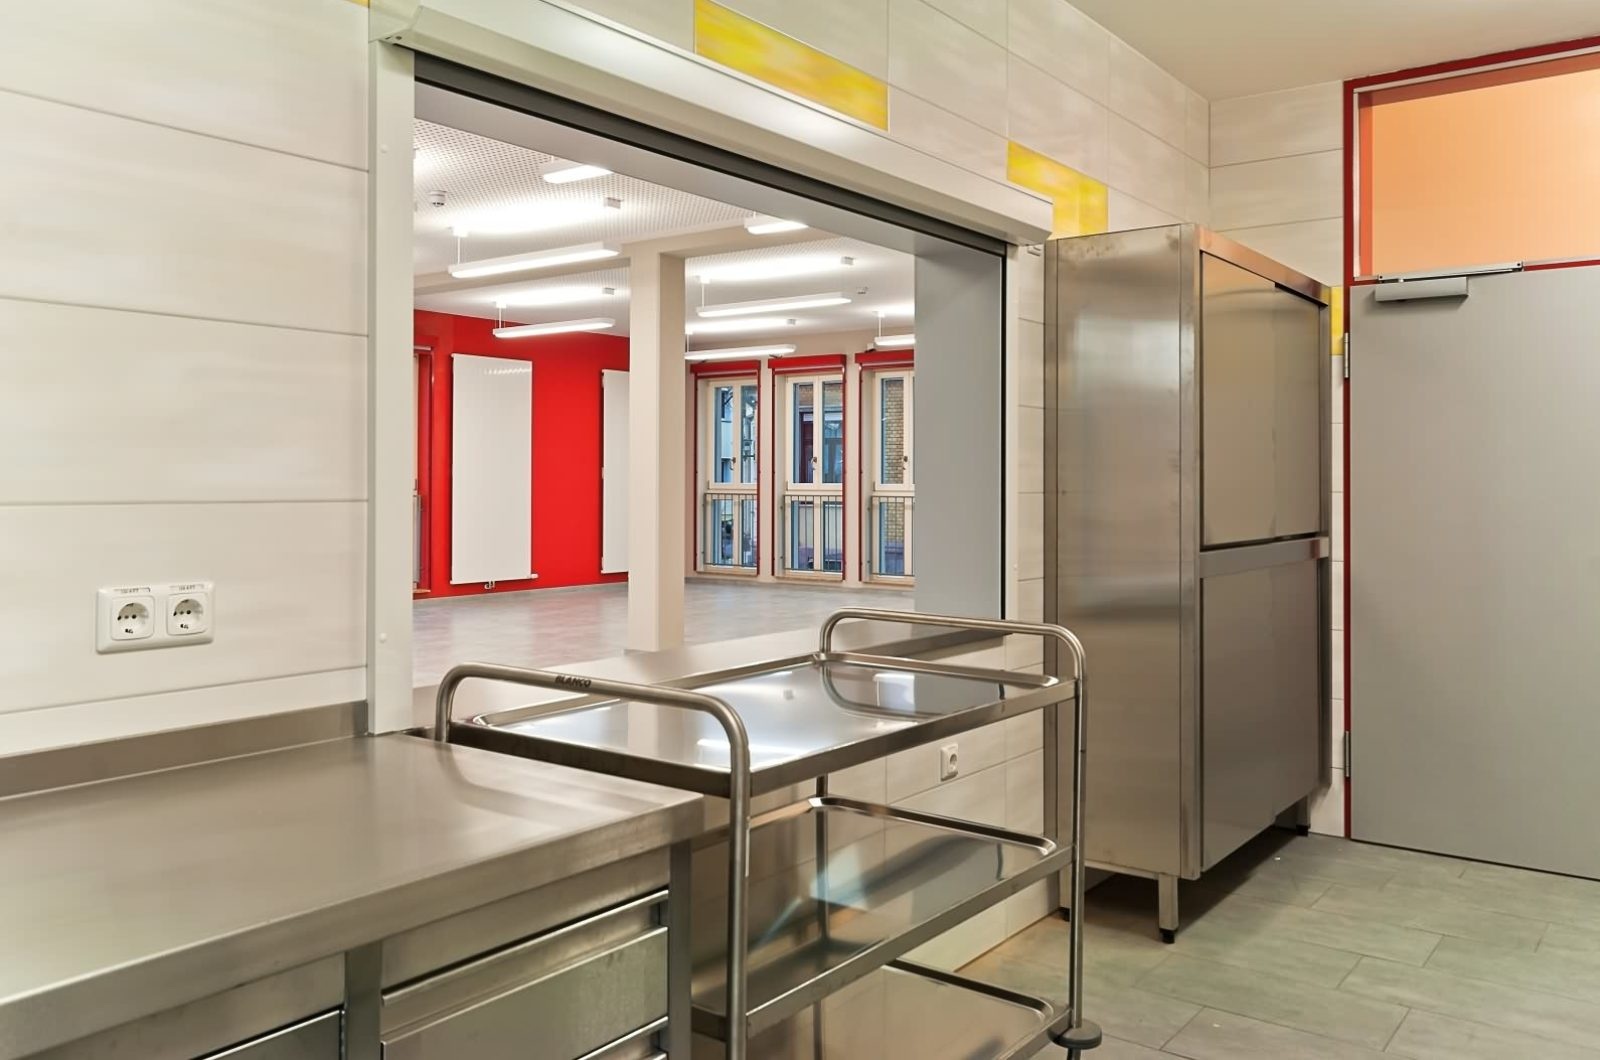 Nolopp Schule Küche